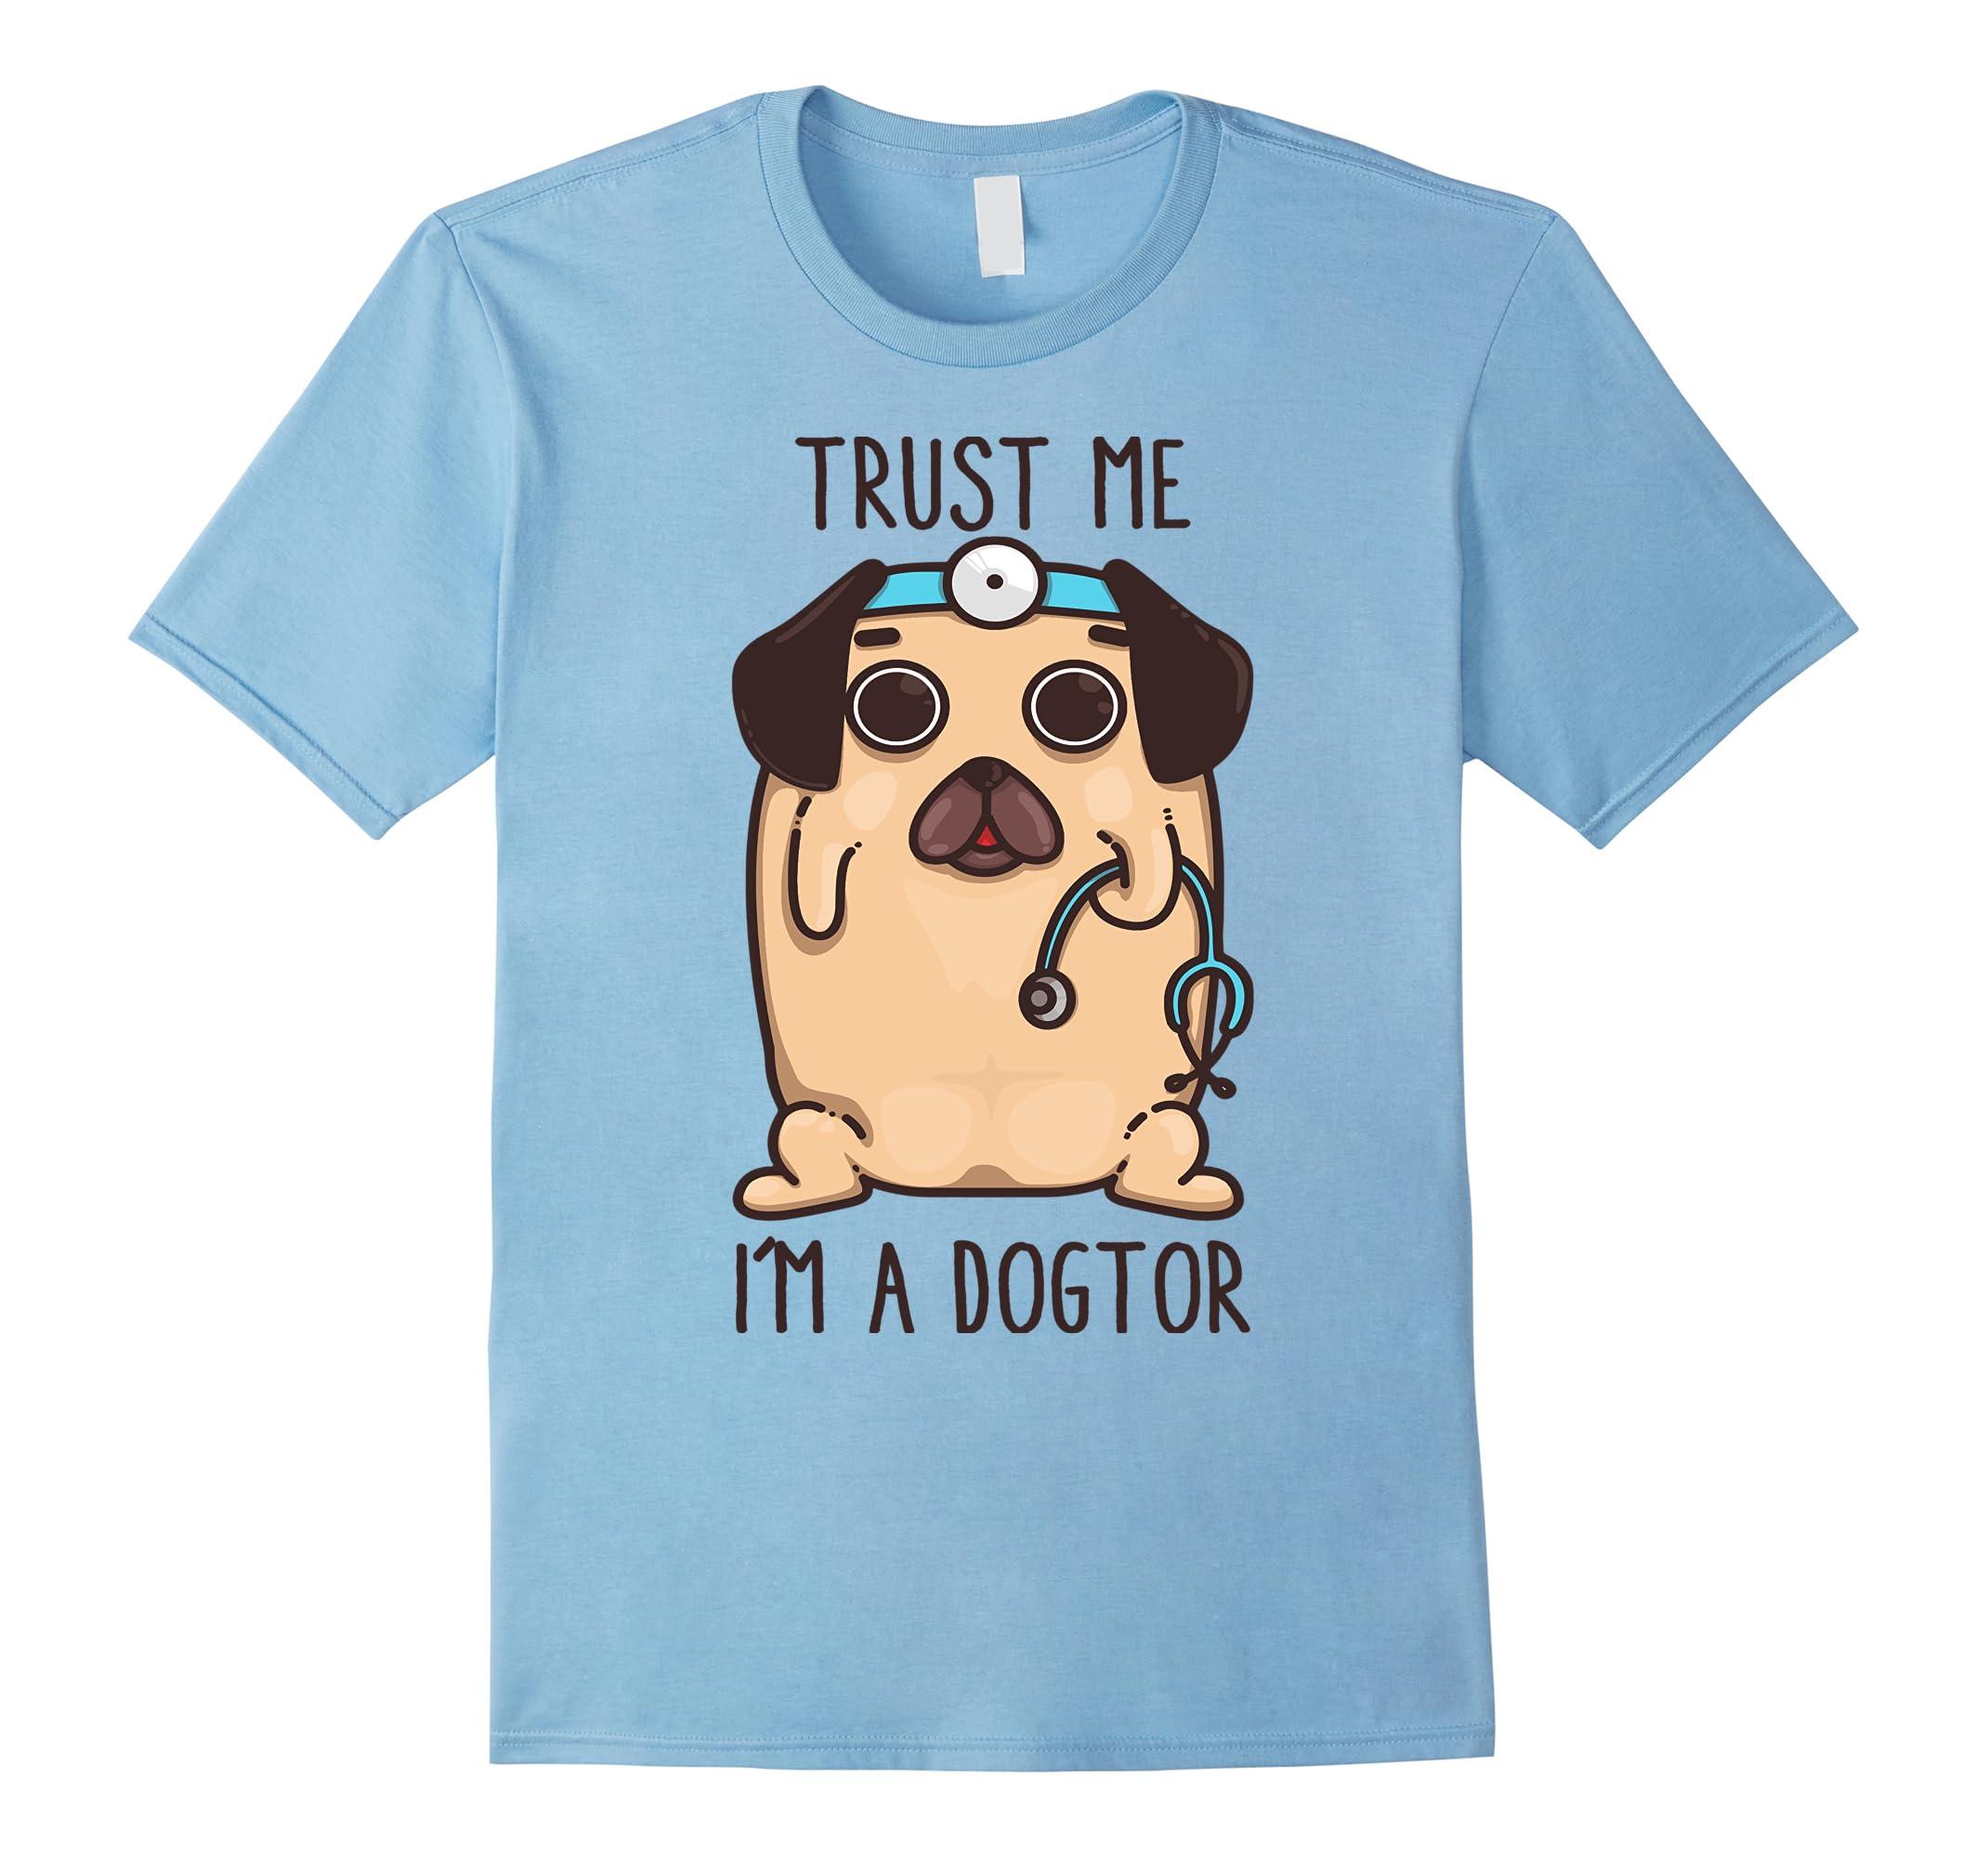 Trust Me I'm A Dogtor Dog Doctor Pug Love Veterinarian Shirt-ah my shirt one gift